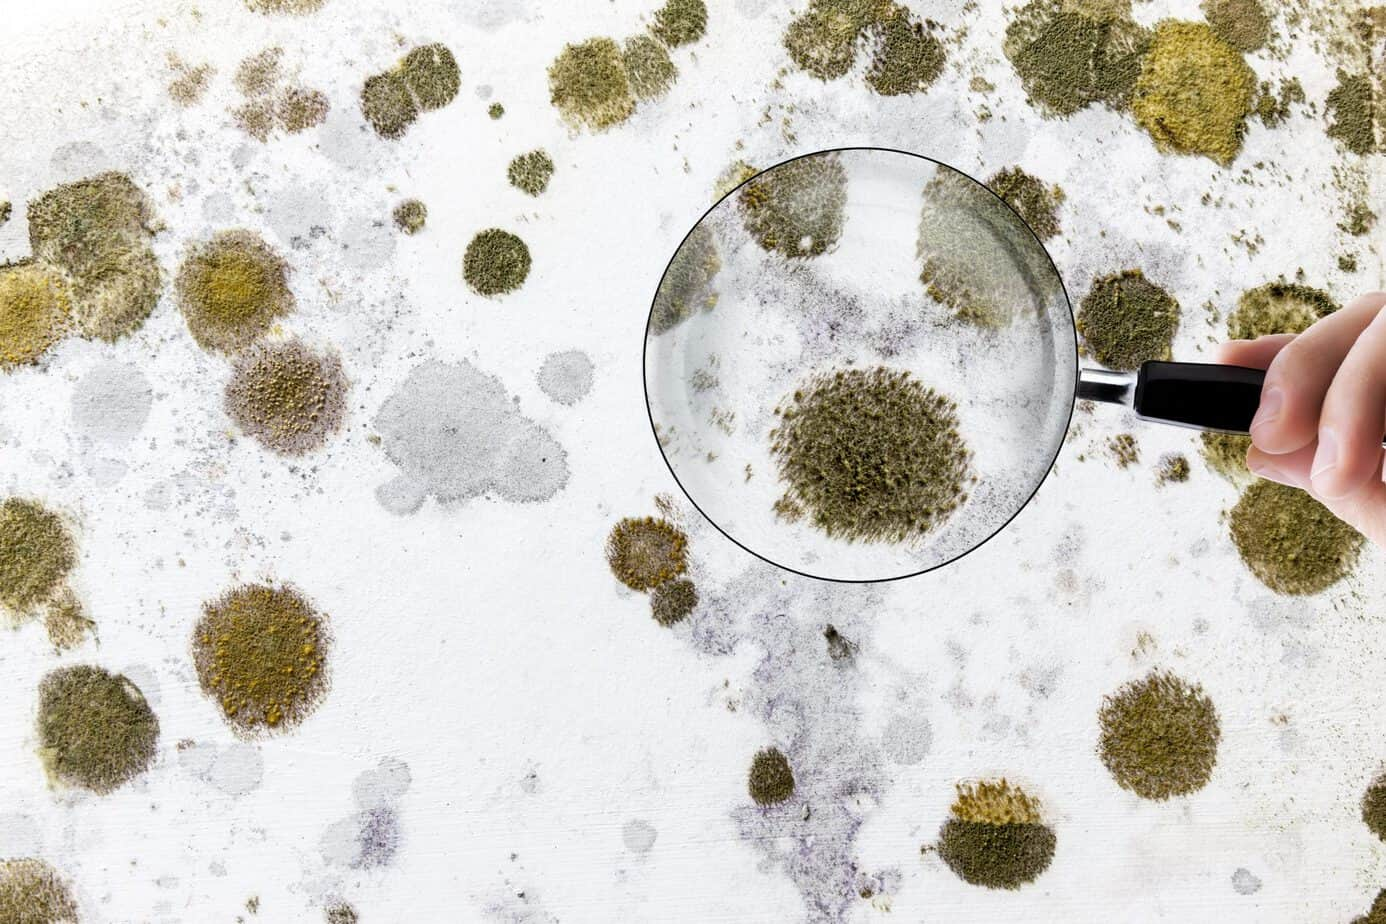 Mold under microscope